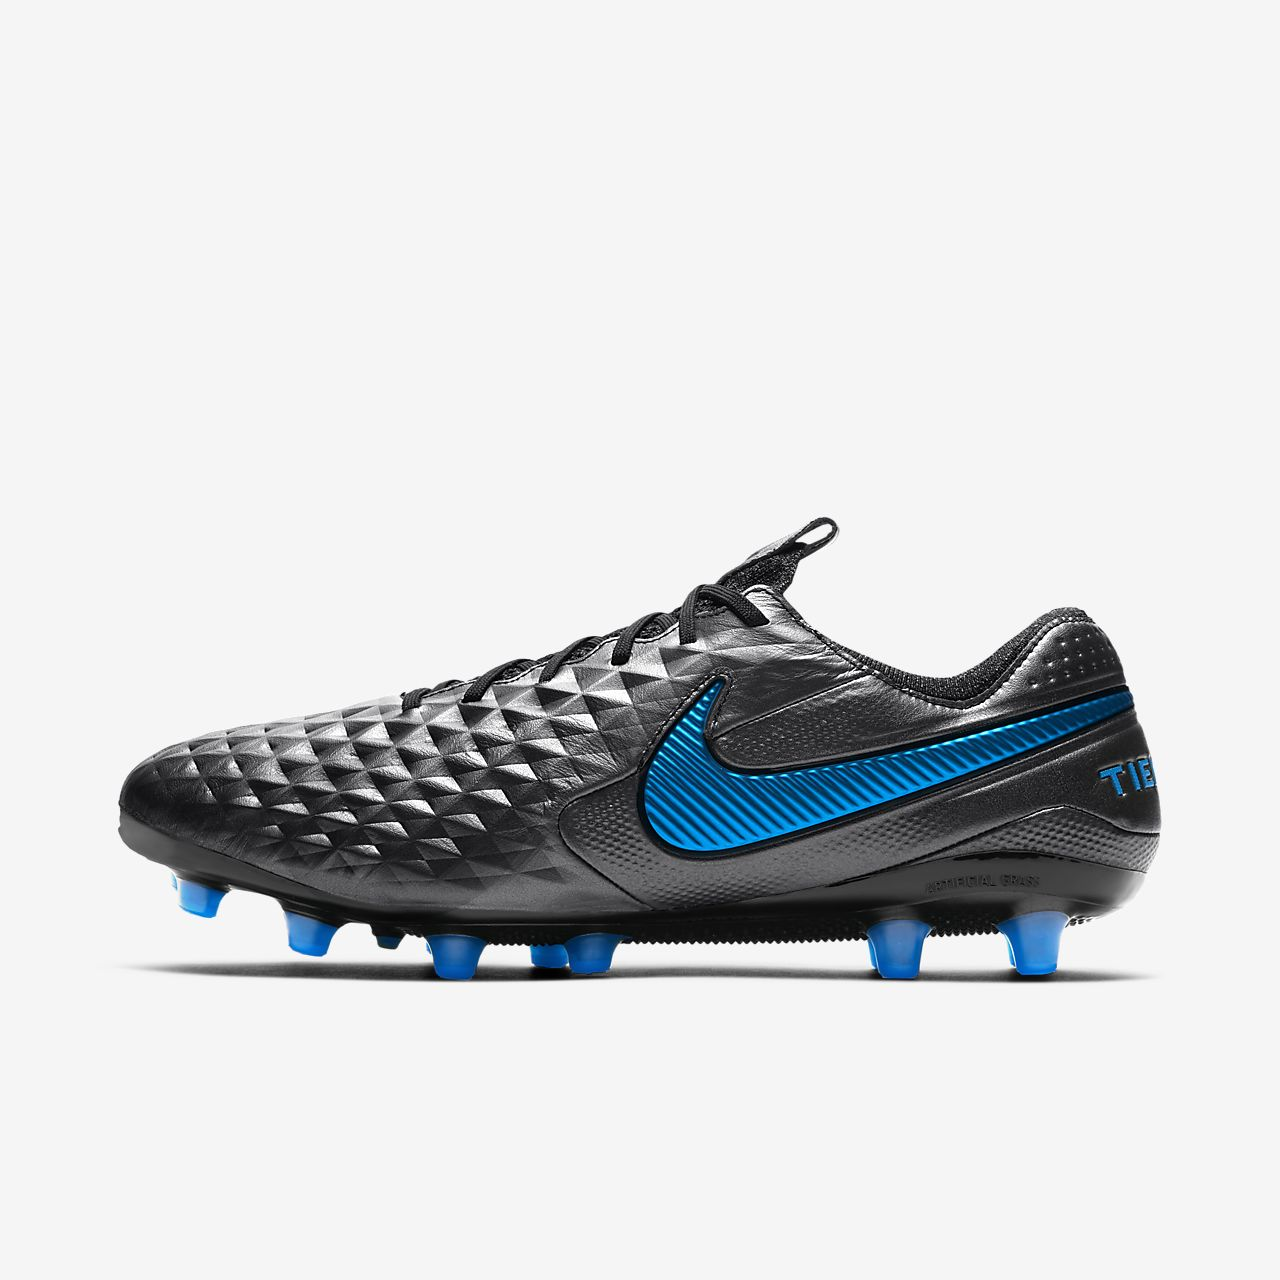 Calzado de fútbol para césped artificial Nike Tiempo Legend 8 Elite AG-PRO